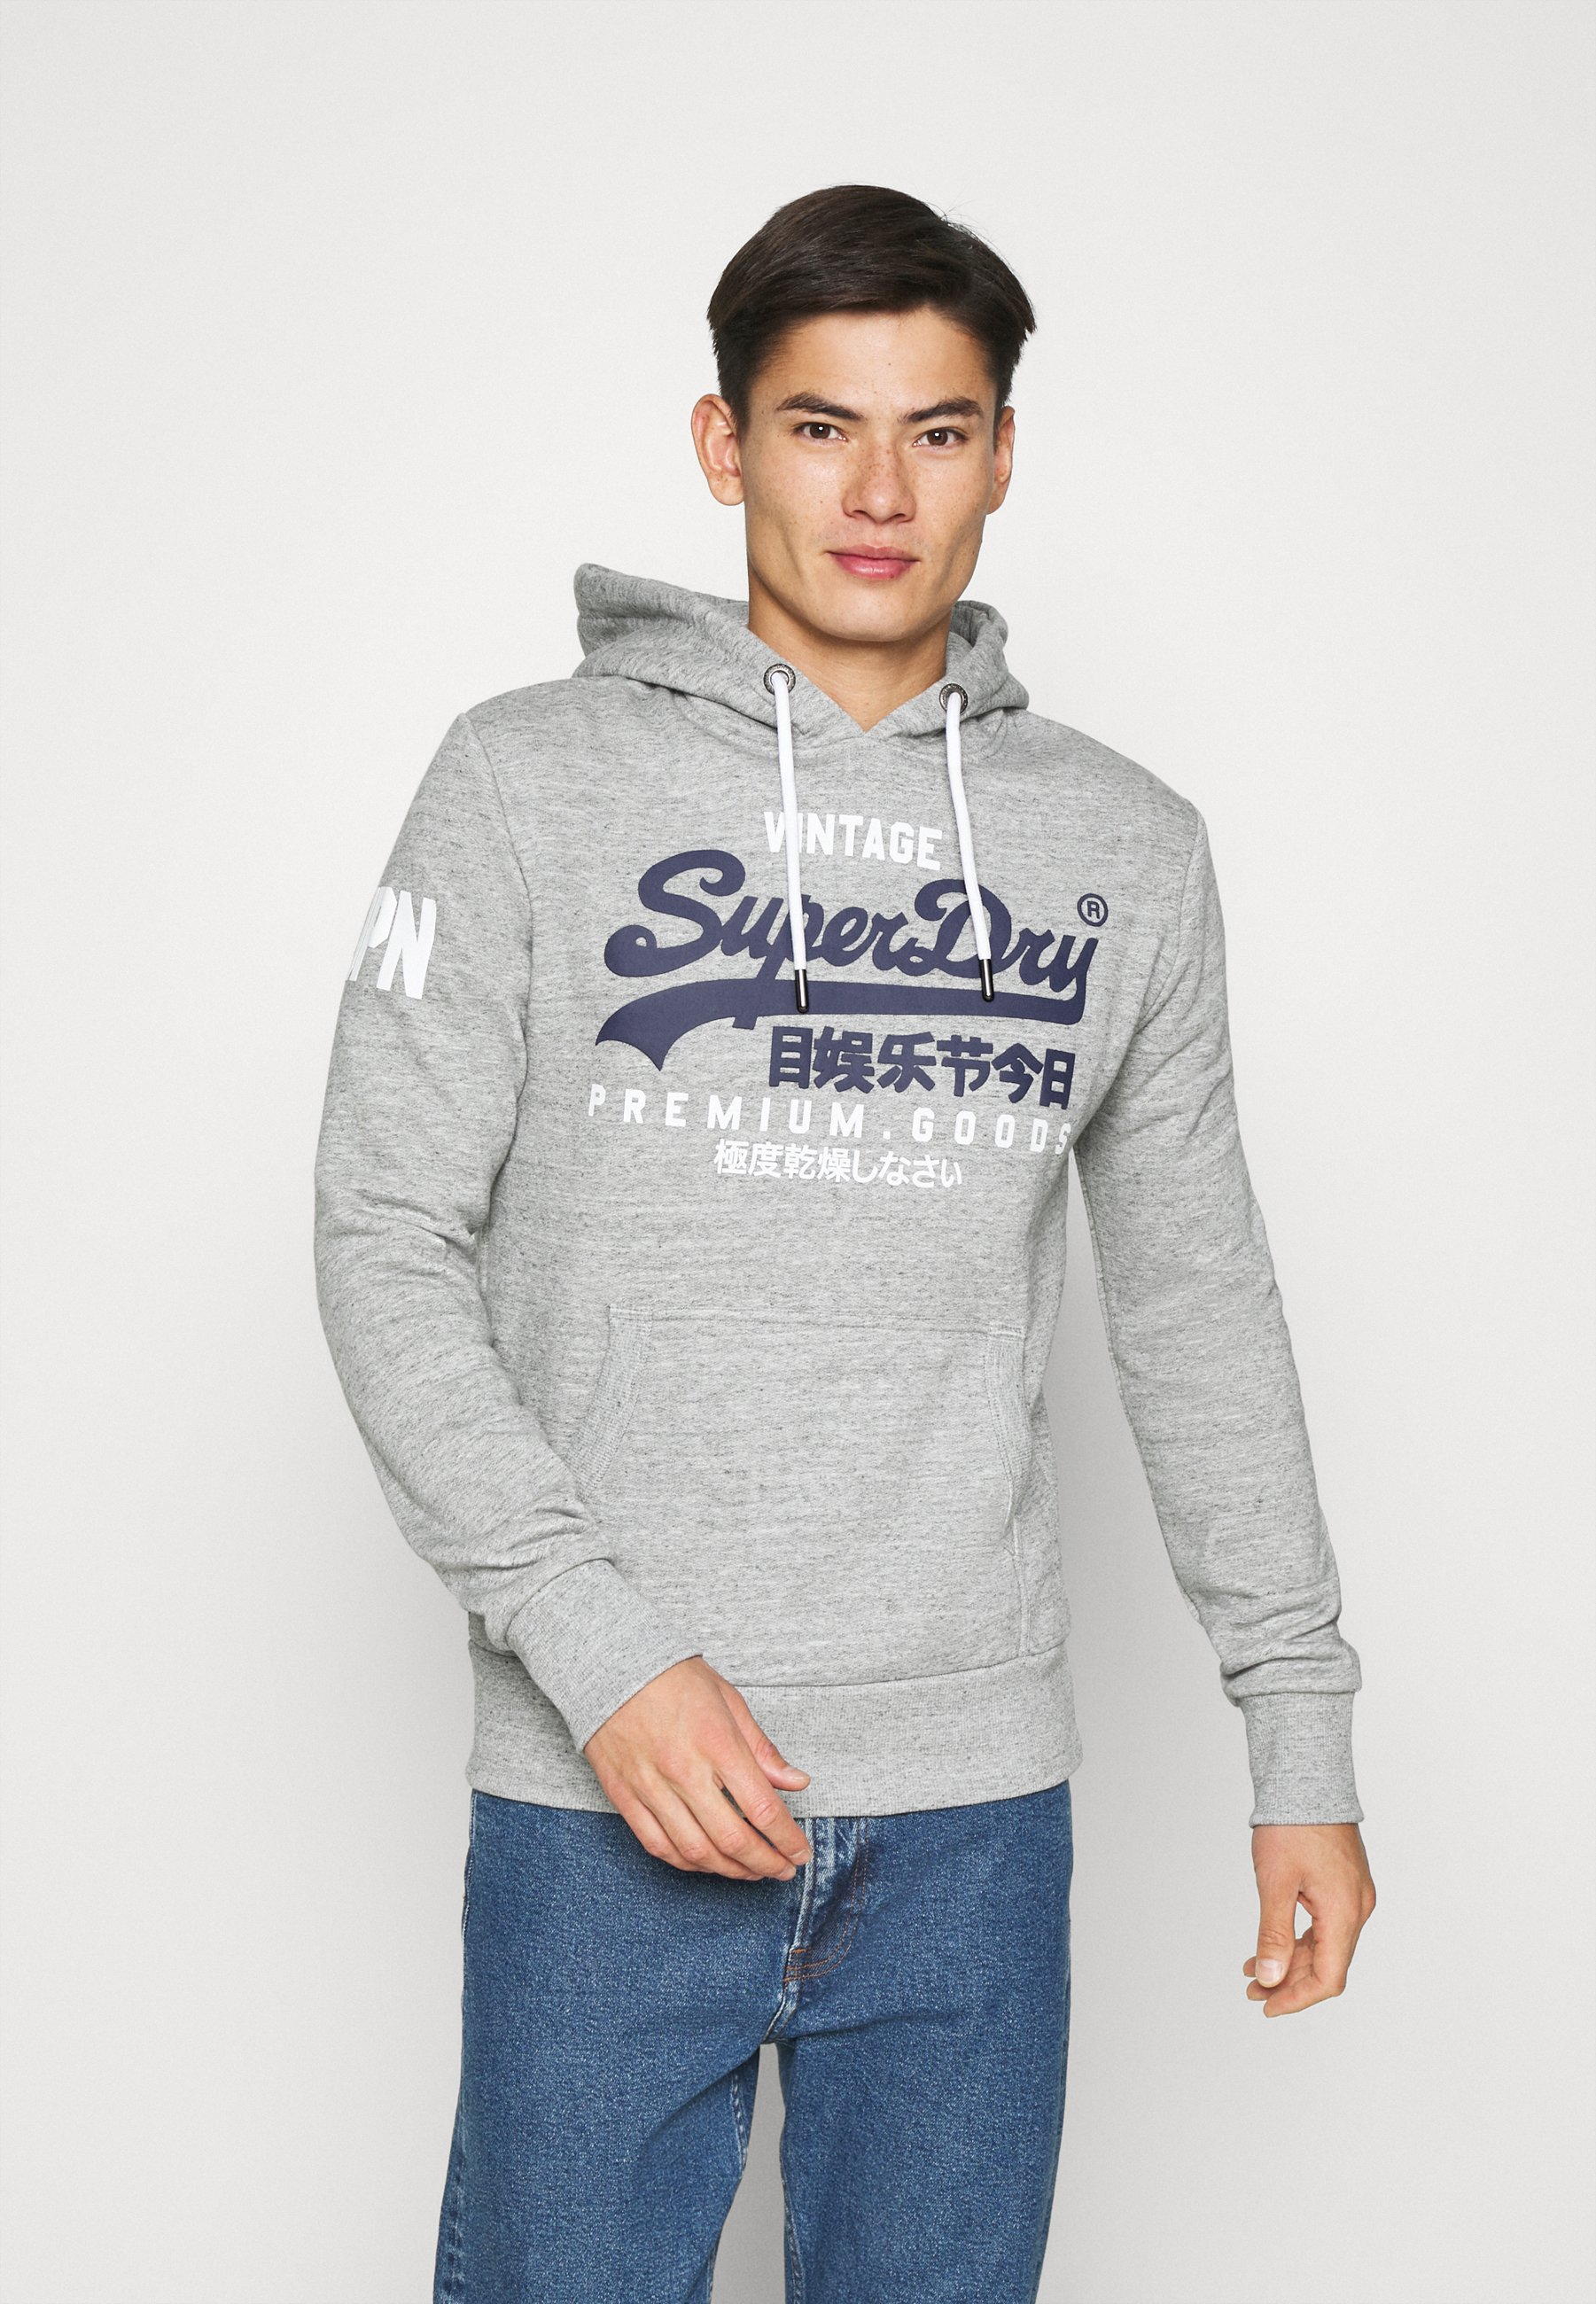 Homme HOOD - Sweat à capuche - grey